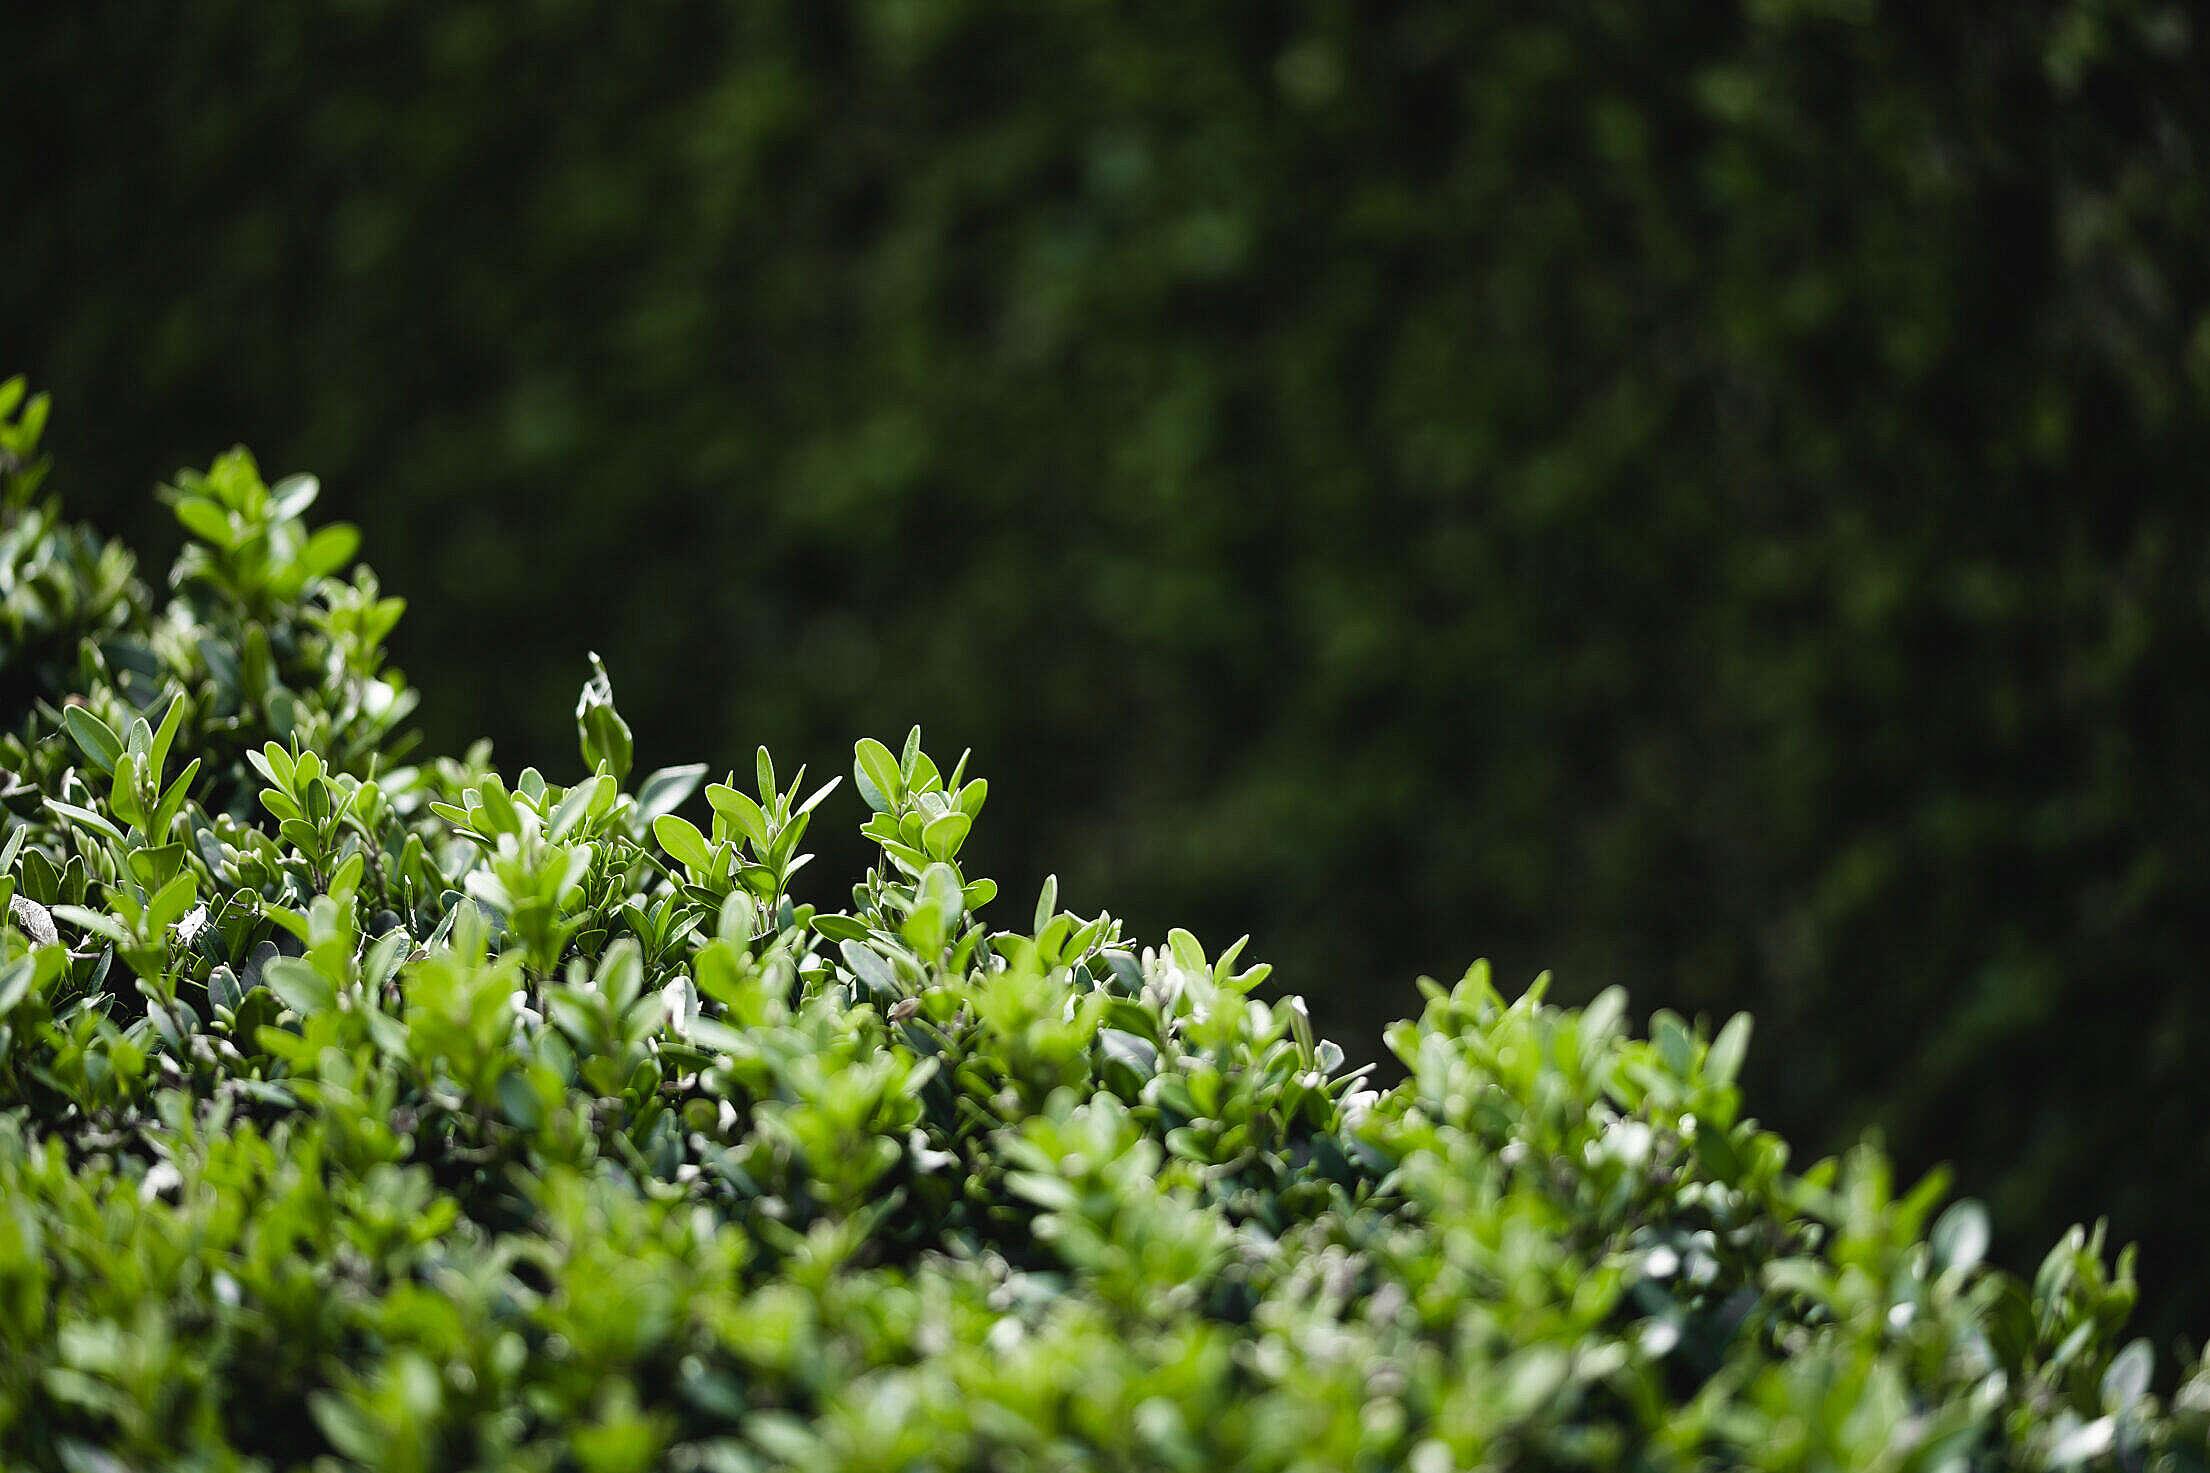 Green Bush Buxus Free Stock Photo